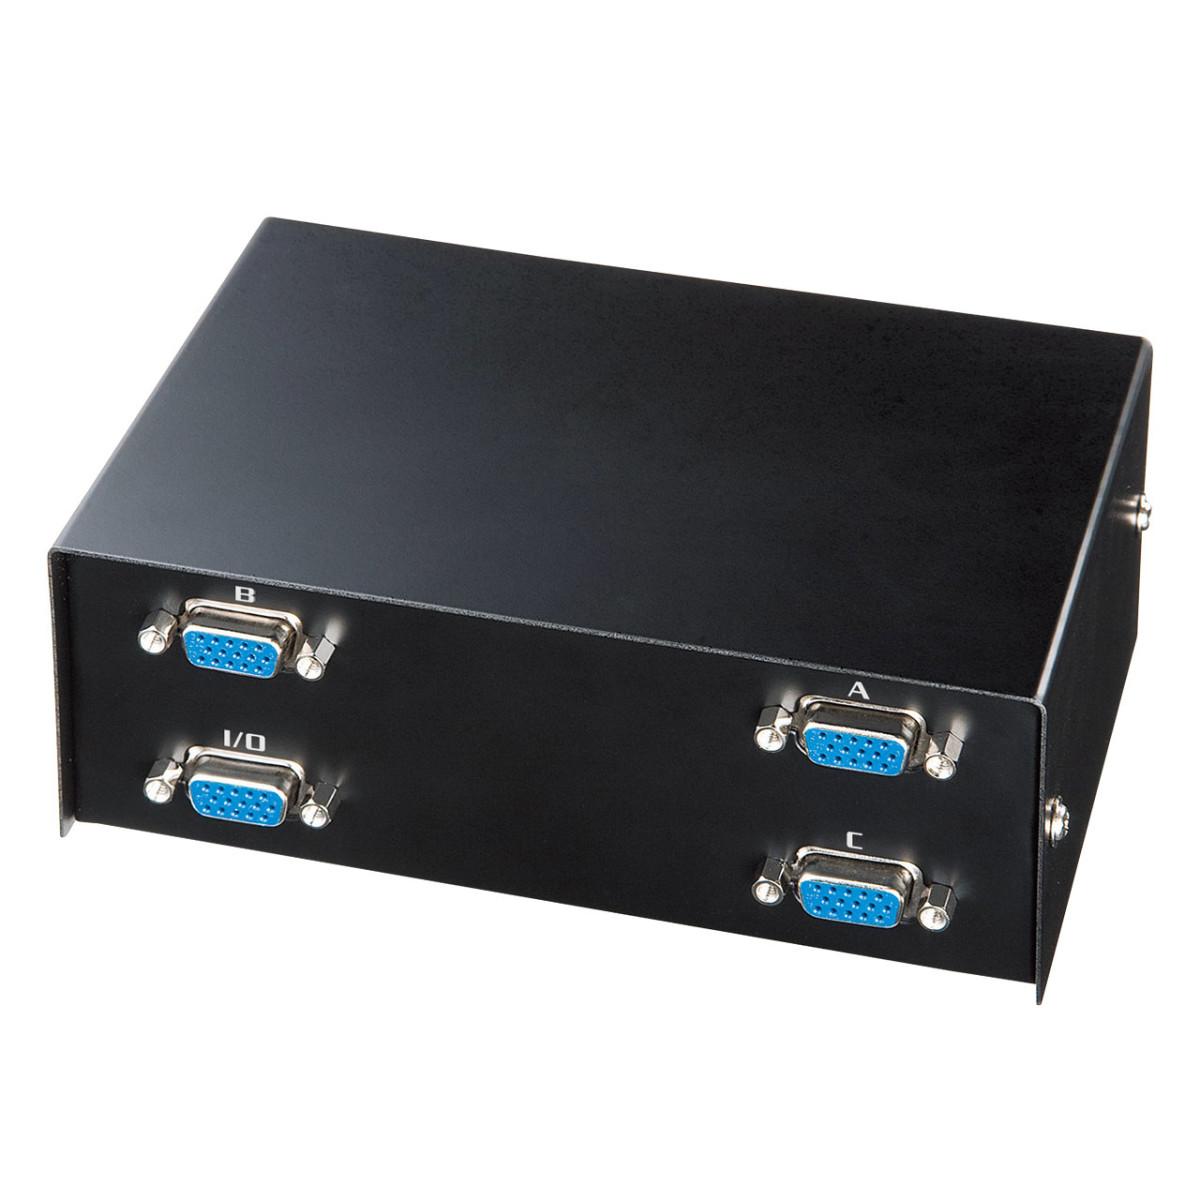 [SWW-31VLN] ディスプレイ切替器(3回路)